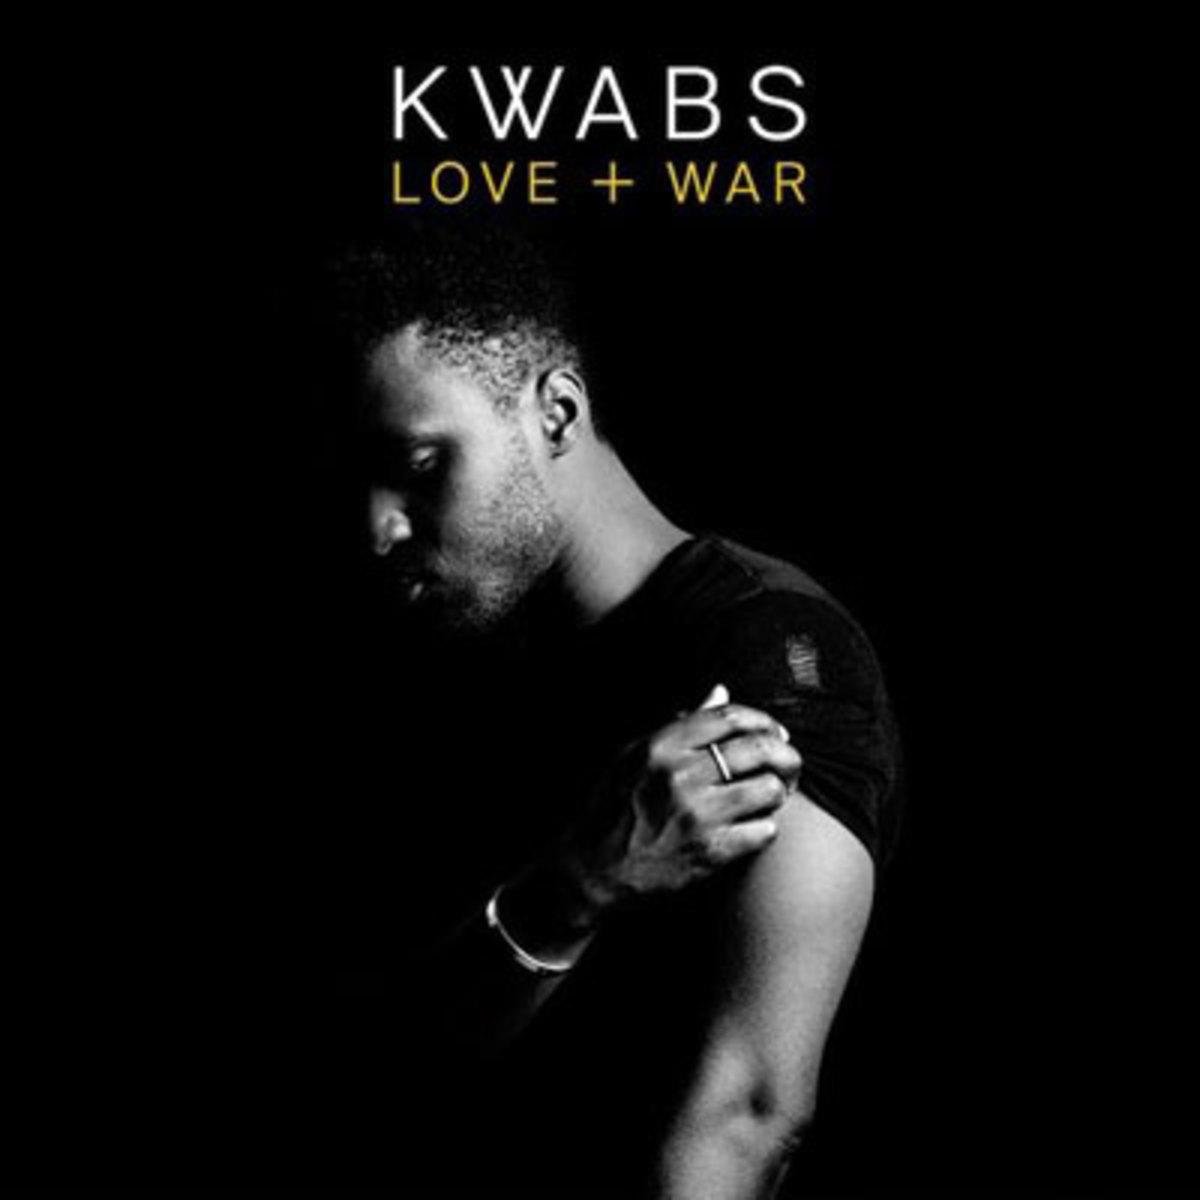 kwabs-lovewar.jpg